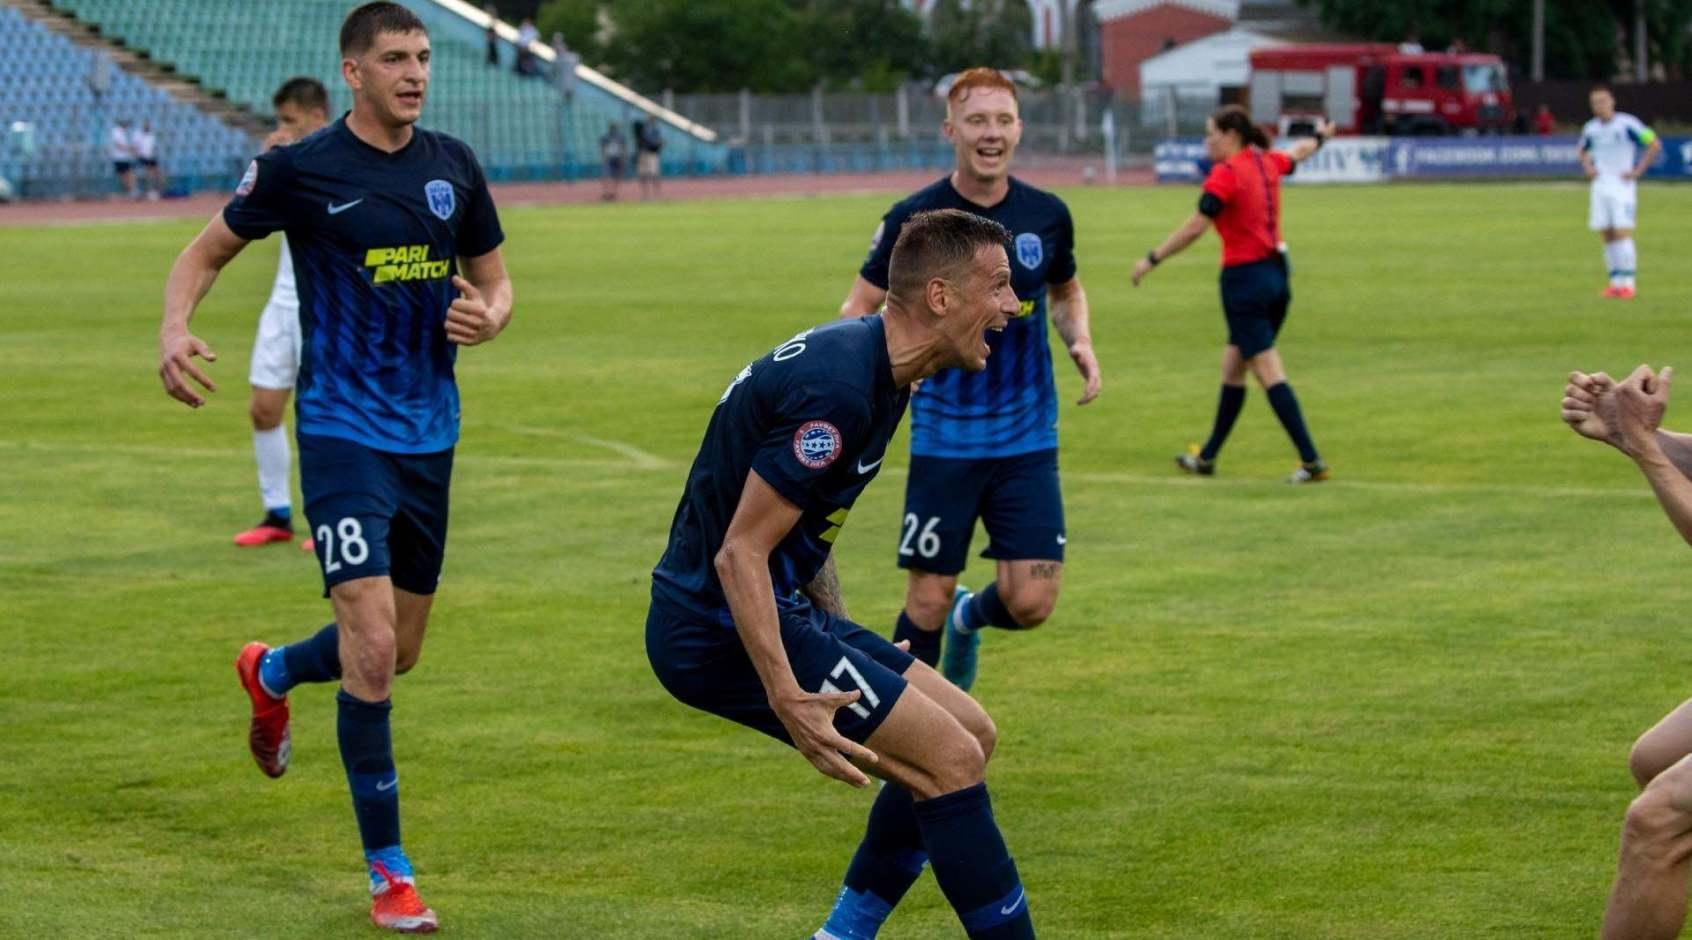 Битва сильнейших в УПЛ: черниговский футбол на подъеме